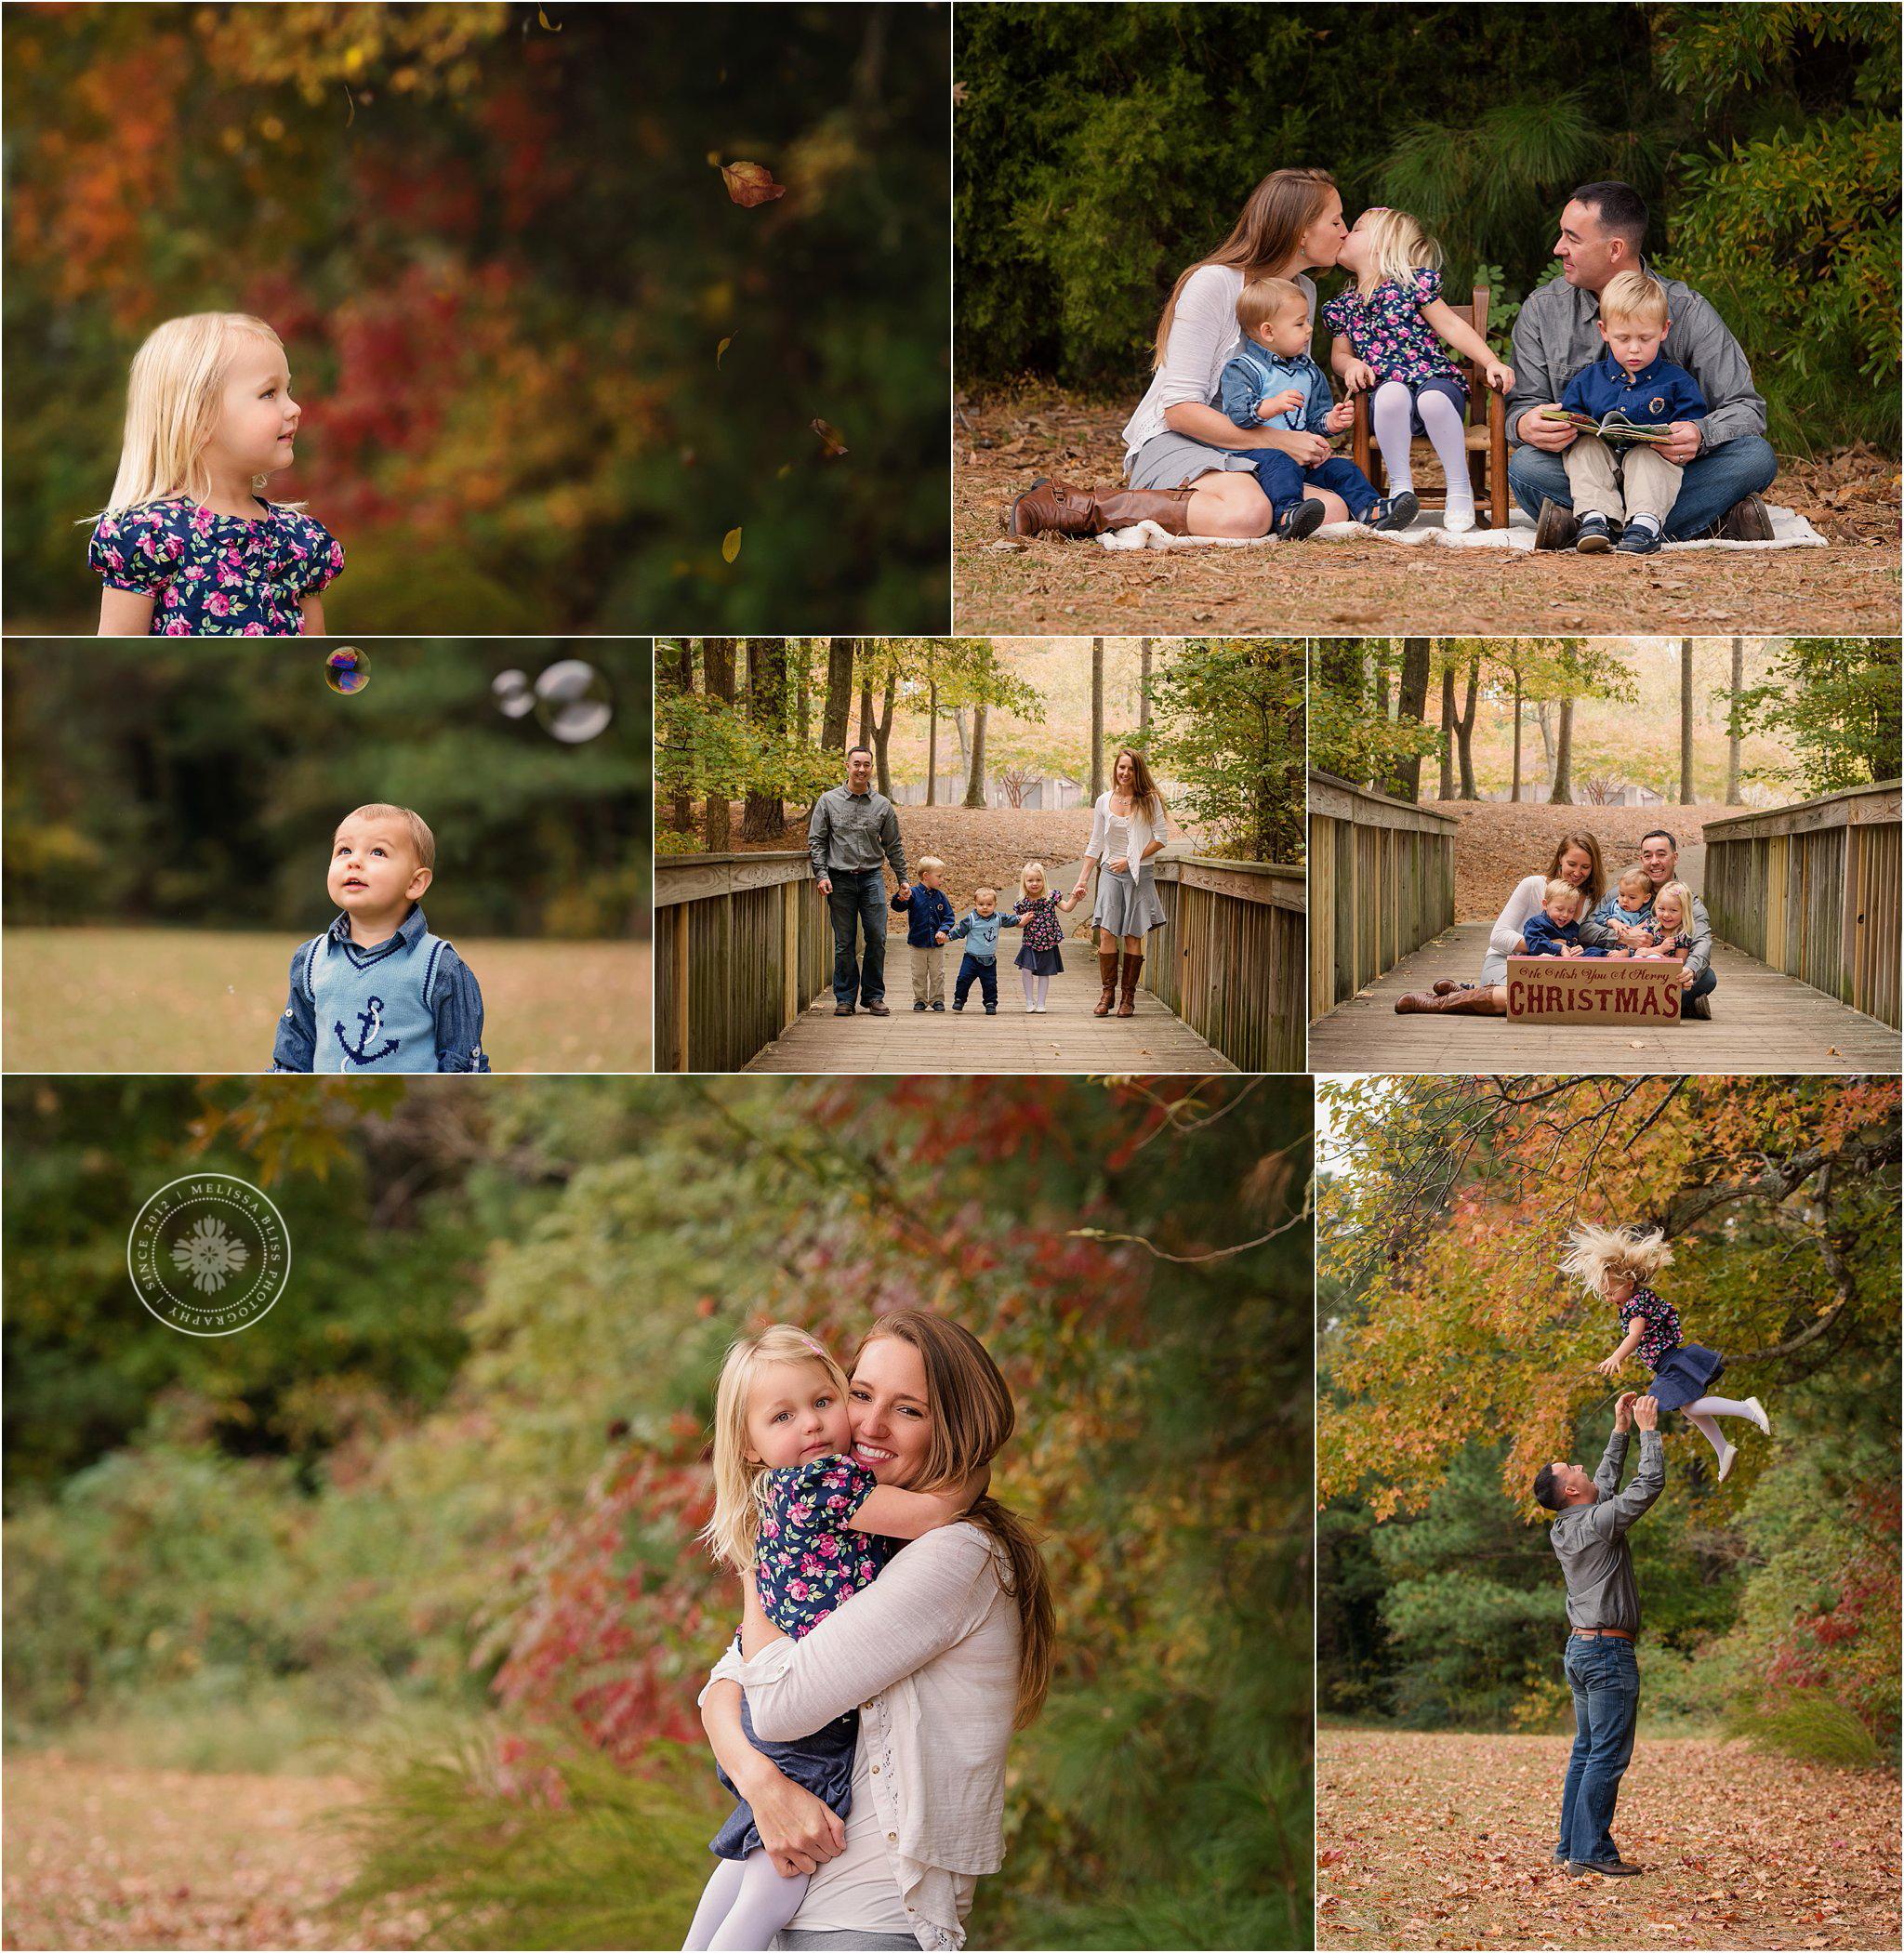 chesapeake-family-photography-virginia-beach-norfolk-portsmouth-suffolk-photographer-family-photos-mini-session-holiday-portraits-melissa-bliss-photography-hampton-roads-va-1